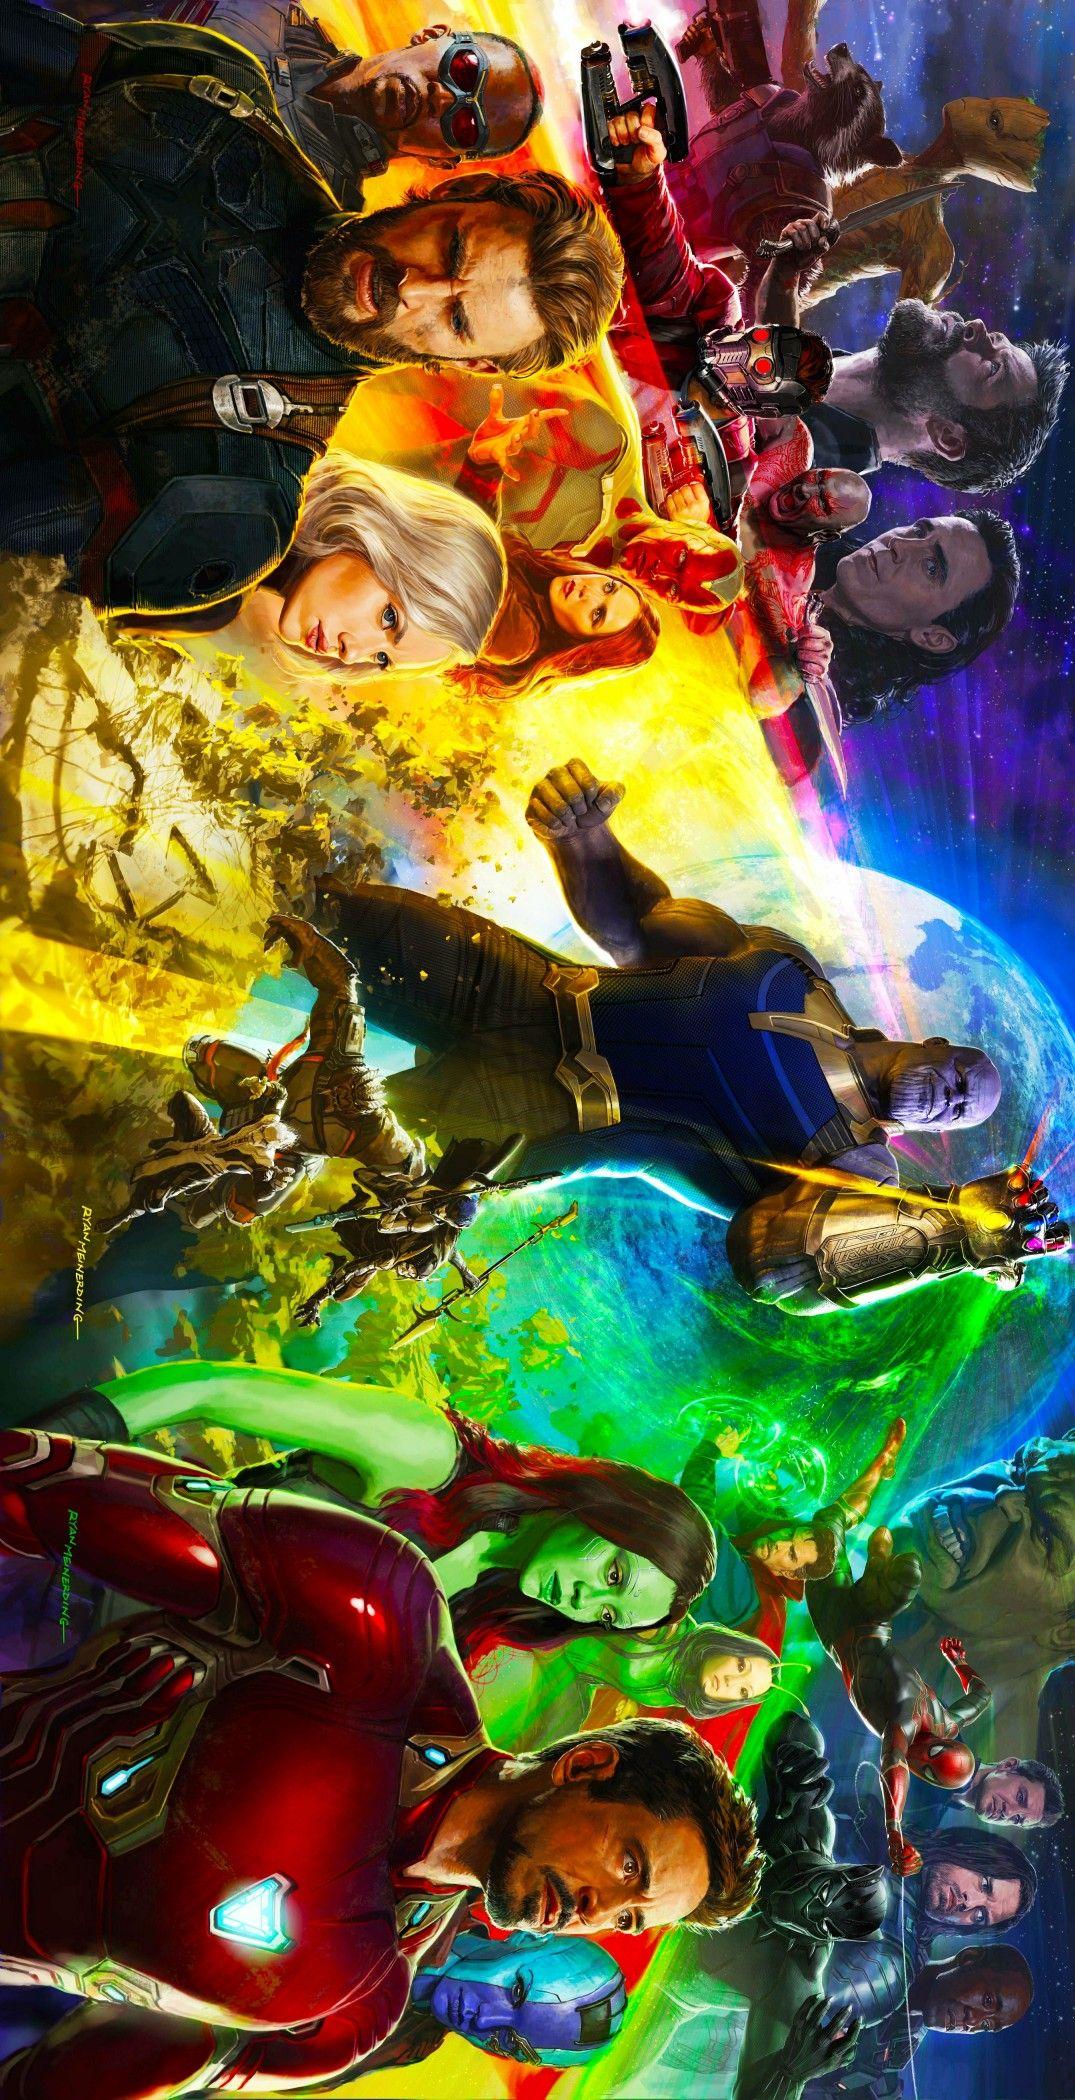 Avengers infinity War All Superheroes Clip Art❤️ #MCU.